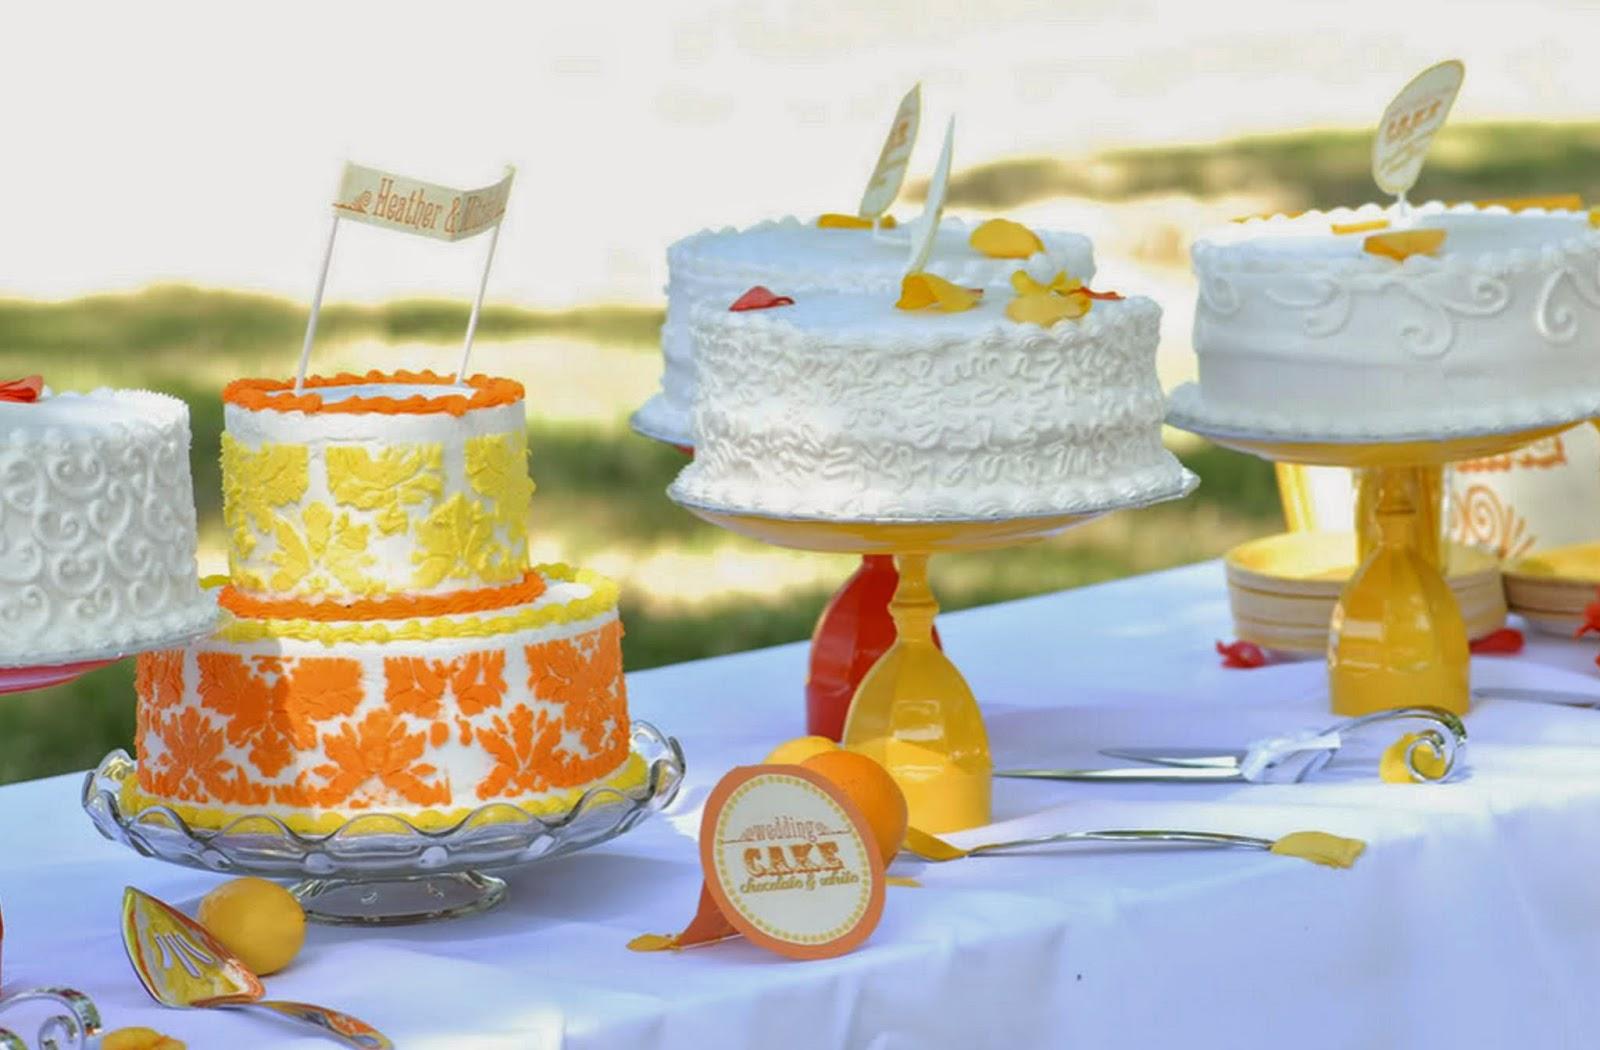 http://eatdrinkpretty.com/2010/09/diy-cake-stand-tutorial.html